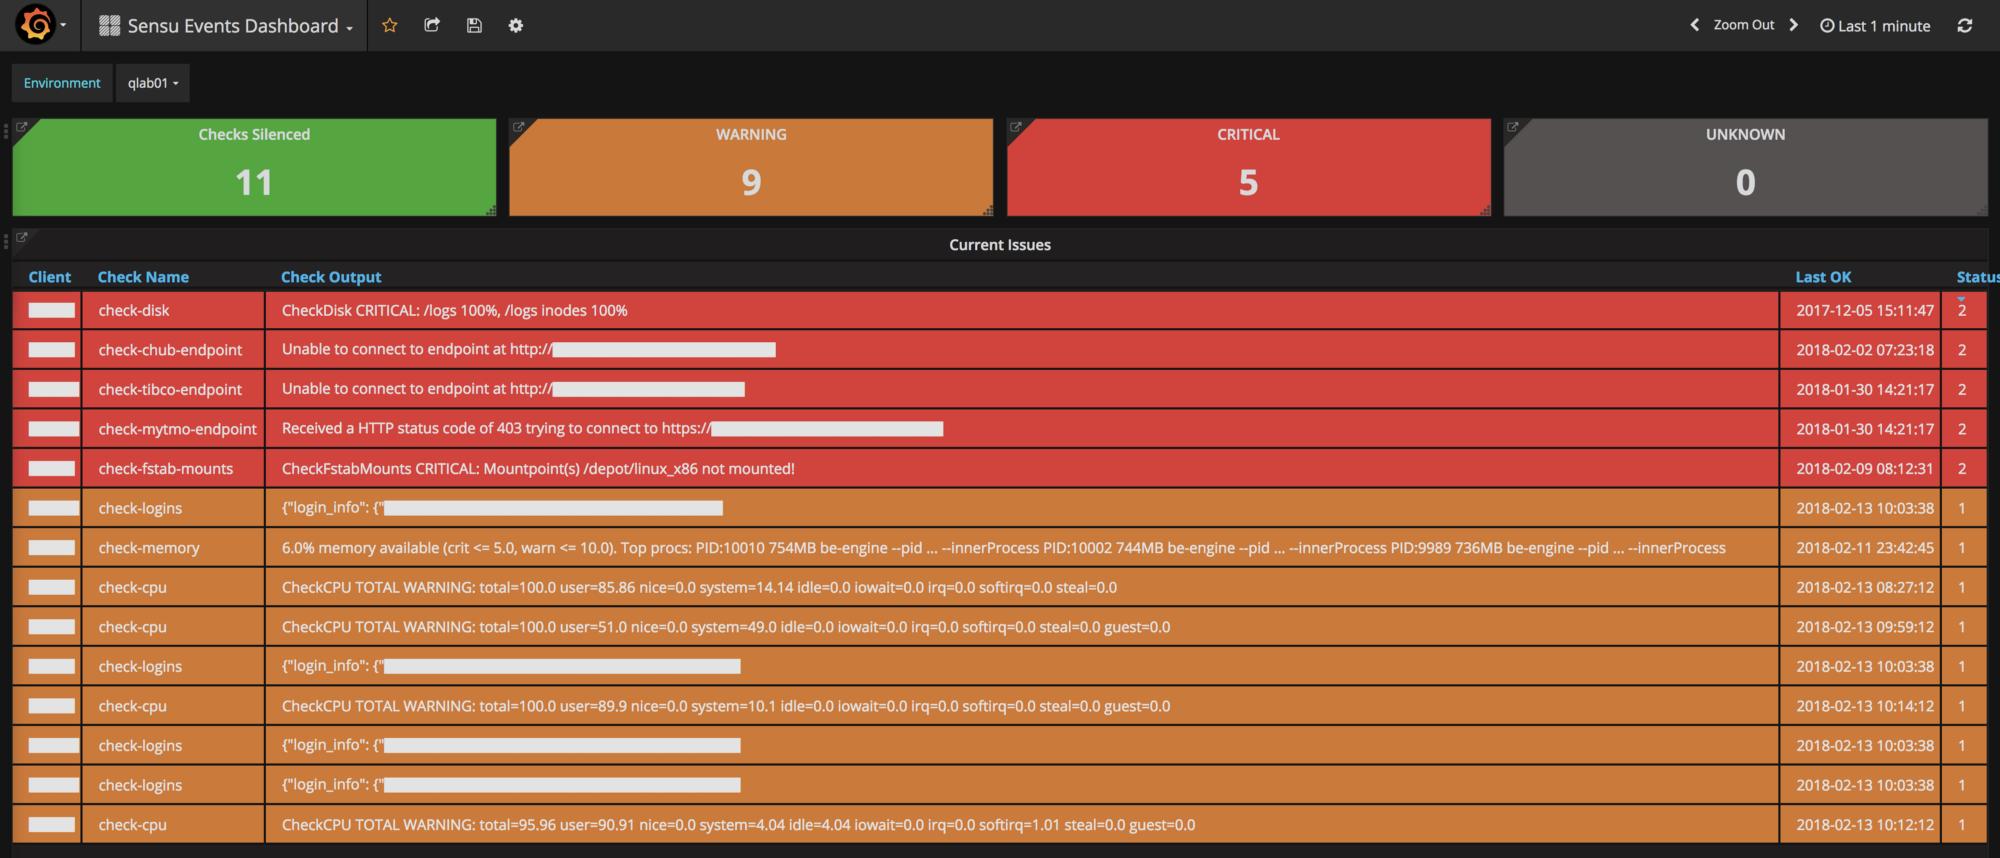 A Primer on Sensu Dashboards